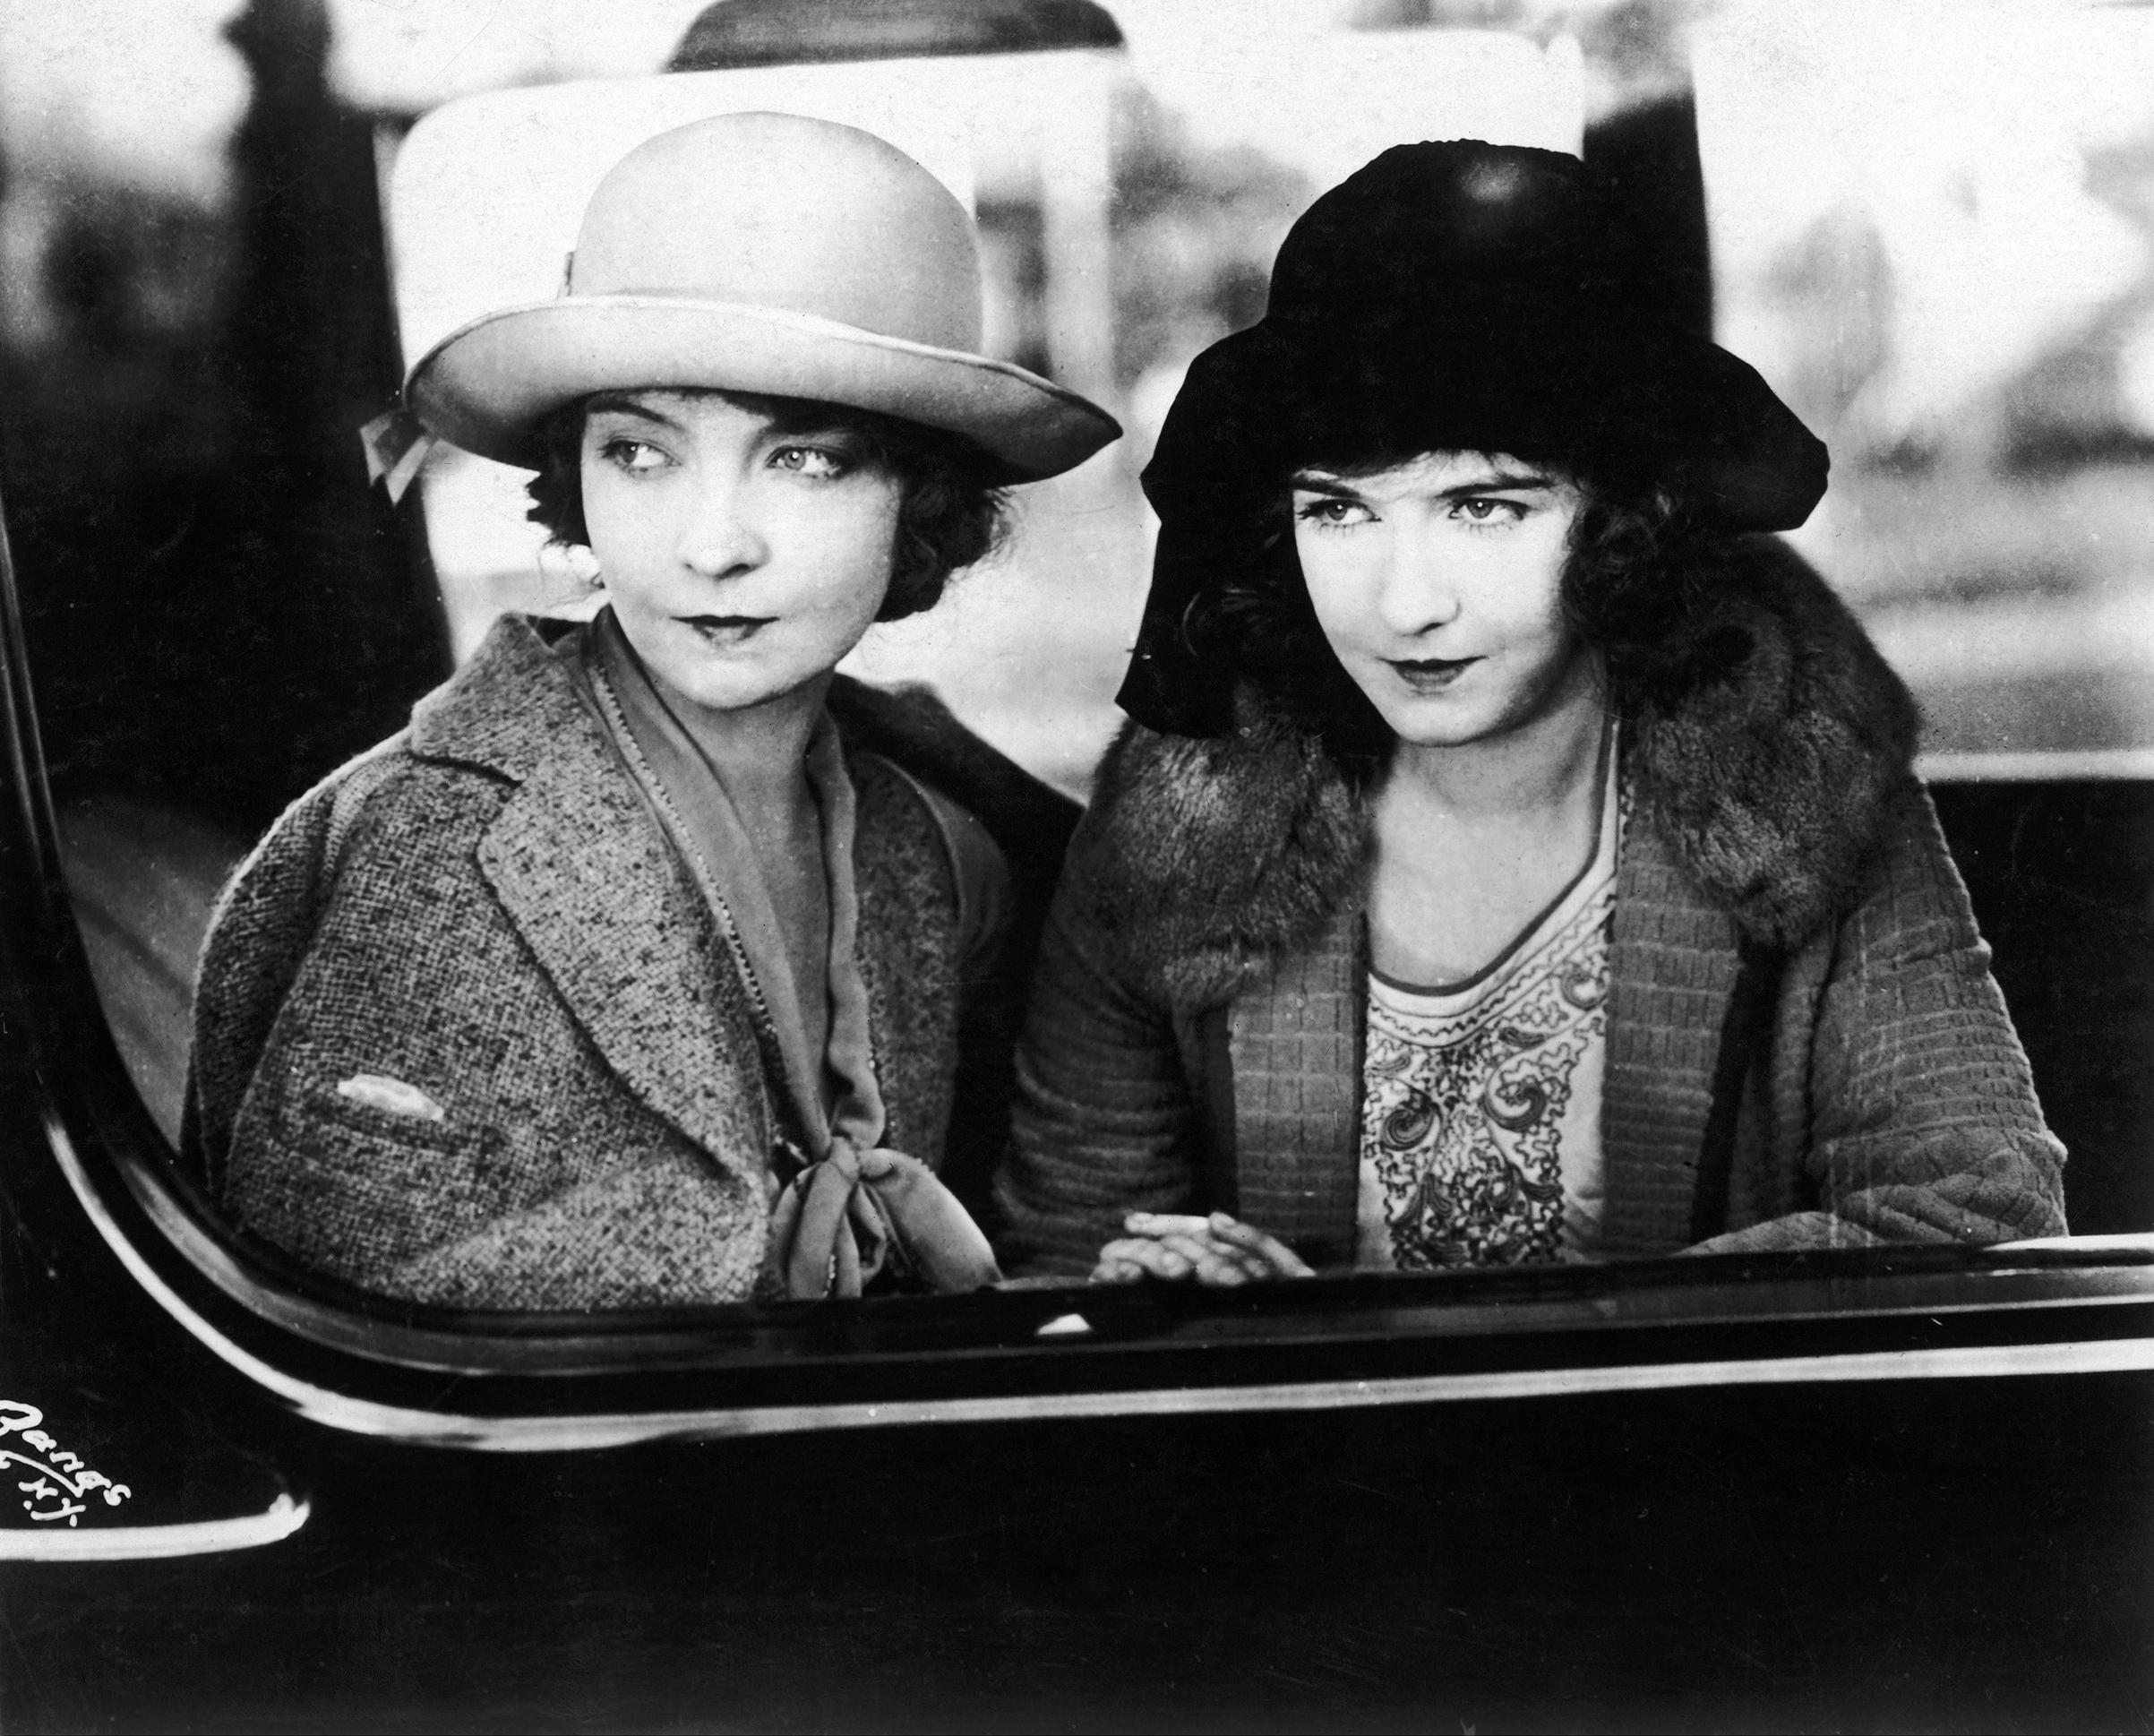 Silent film stars Lillian and Dorothy Gish, circa 1920s.